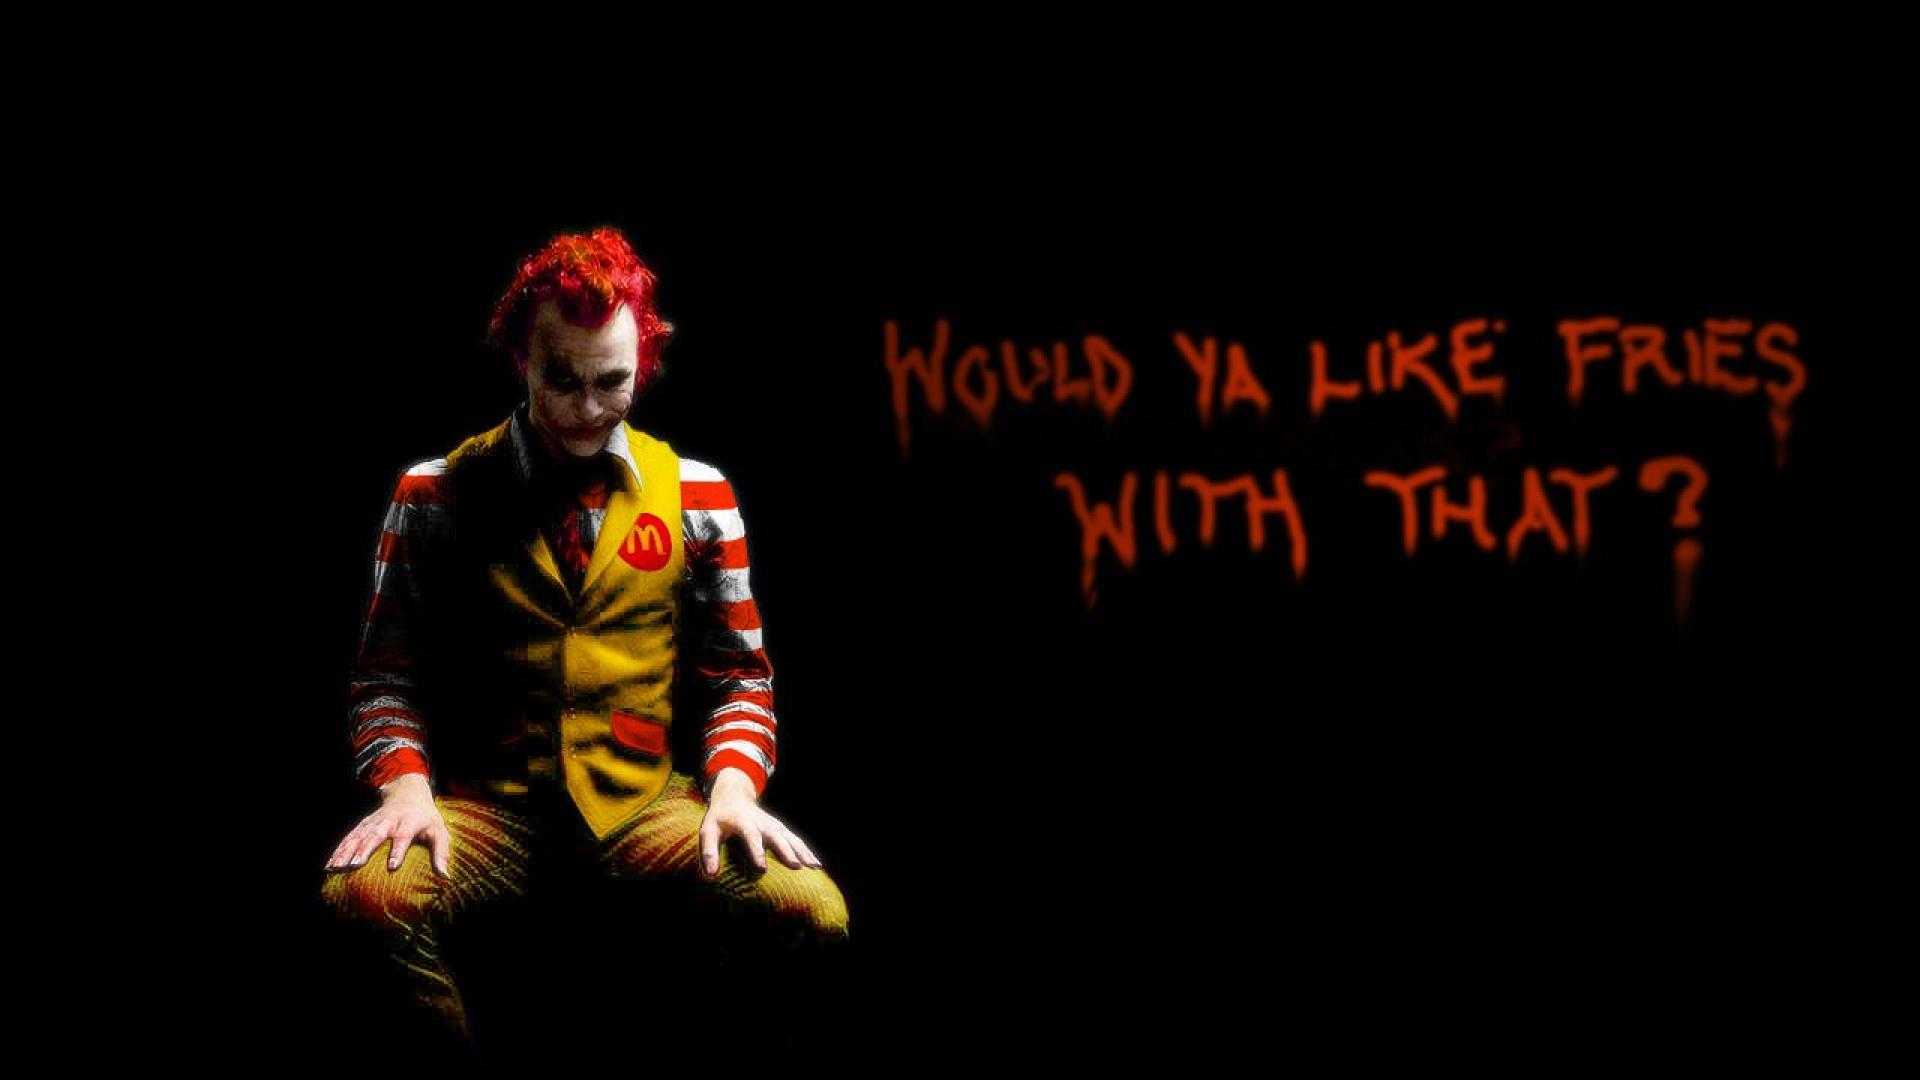 For-Batman-Joker-Hd-wallpaper-wp36012146